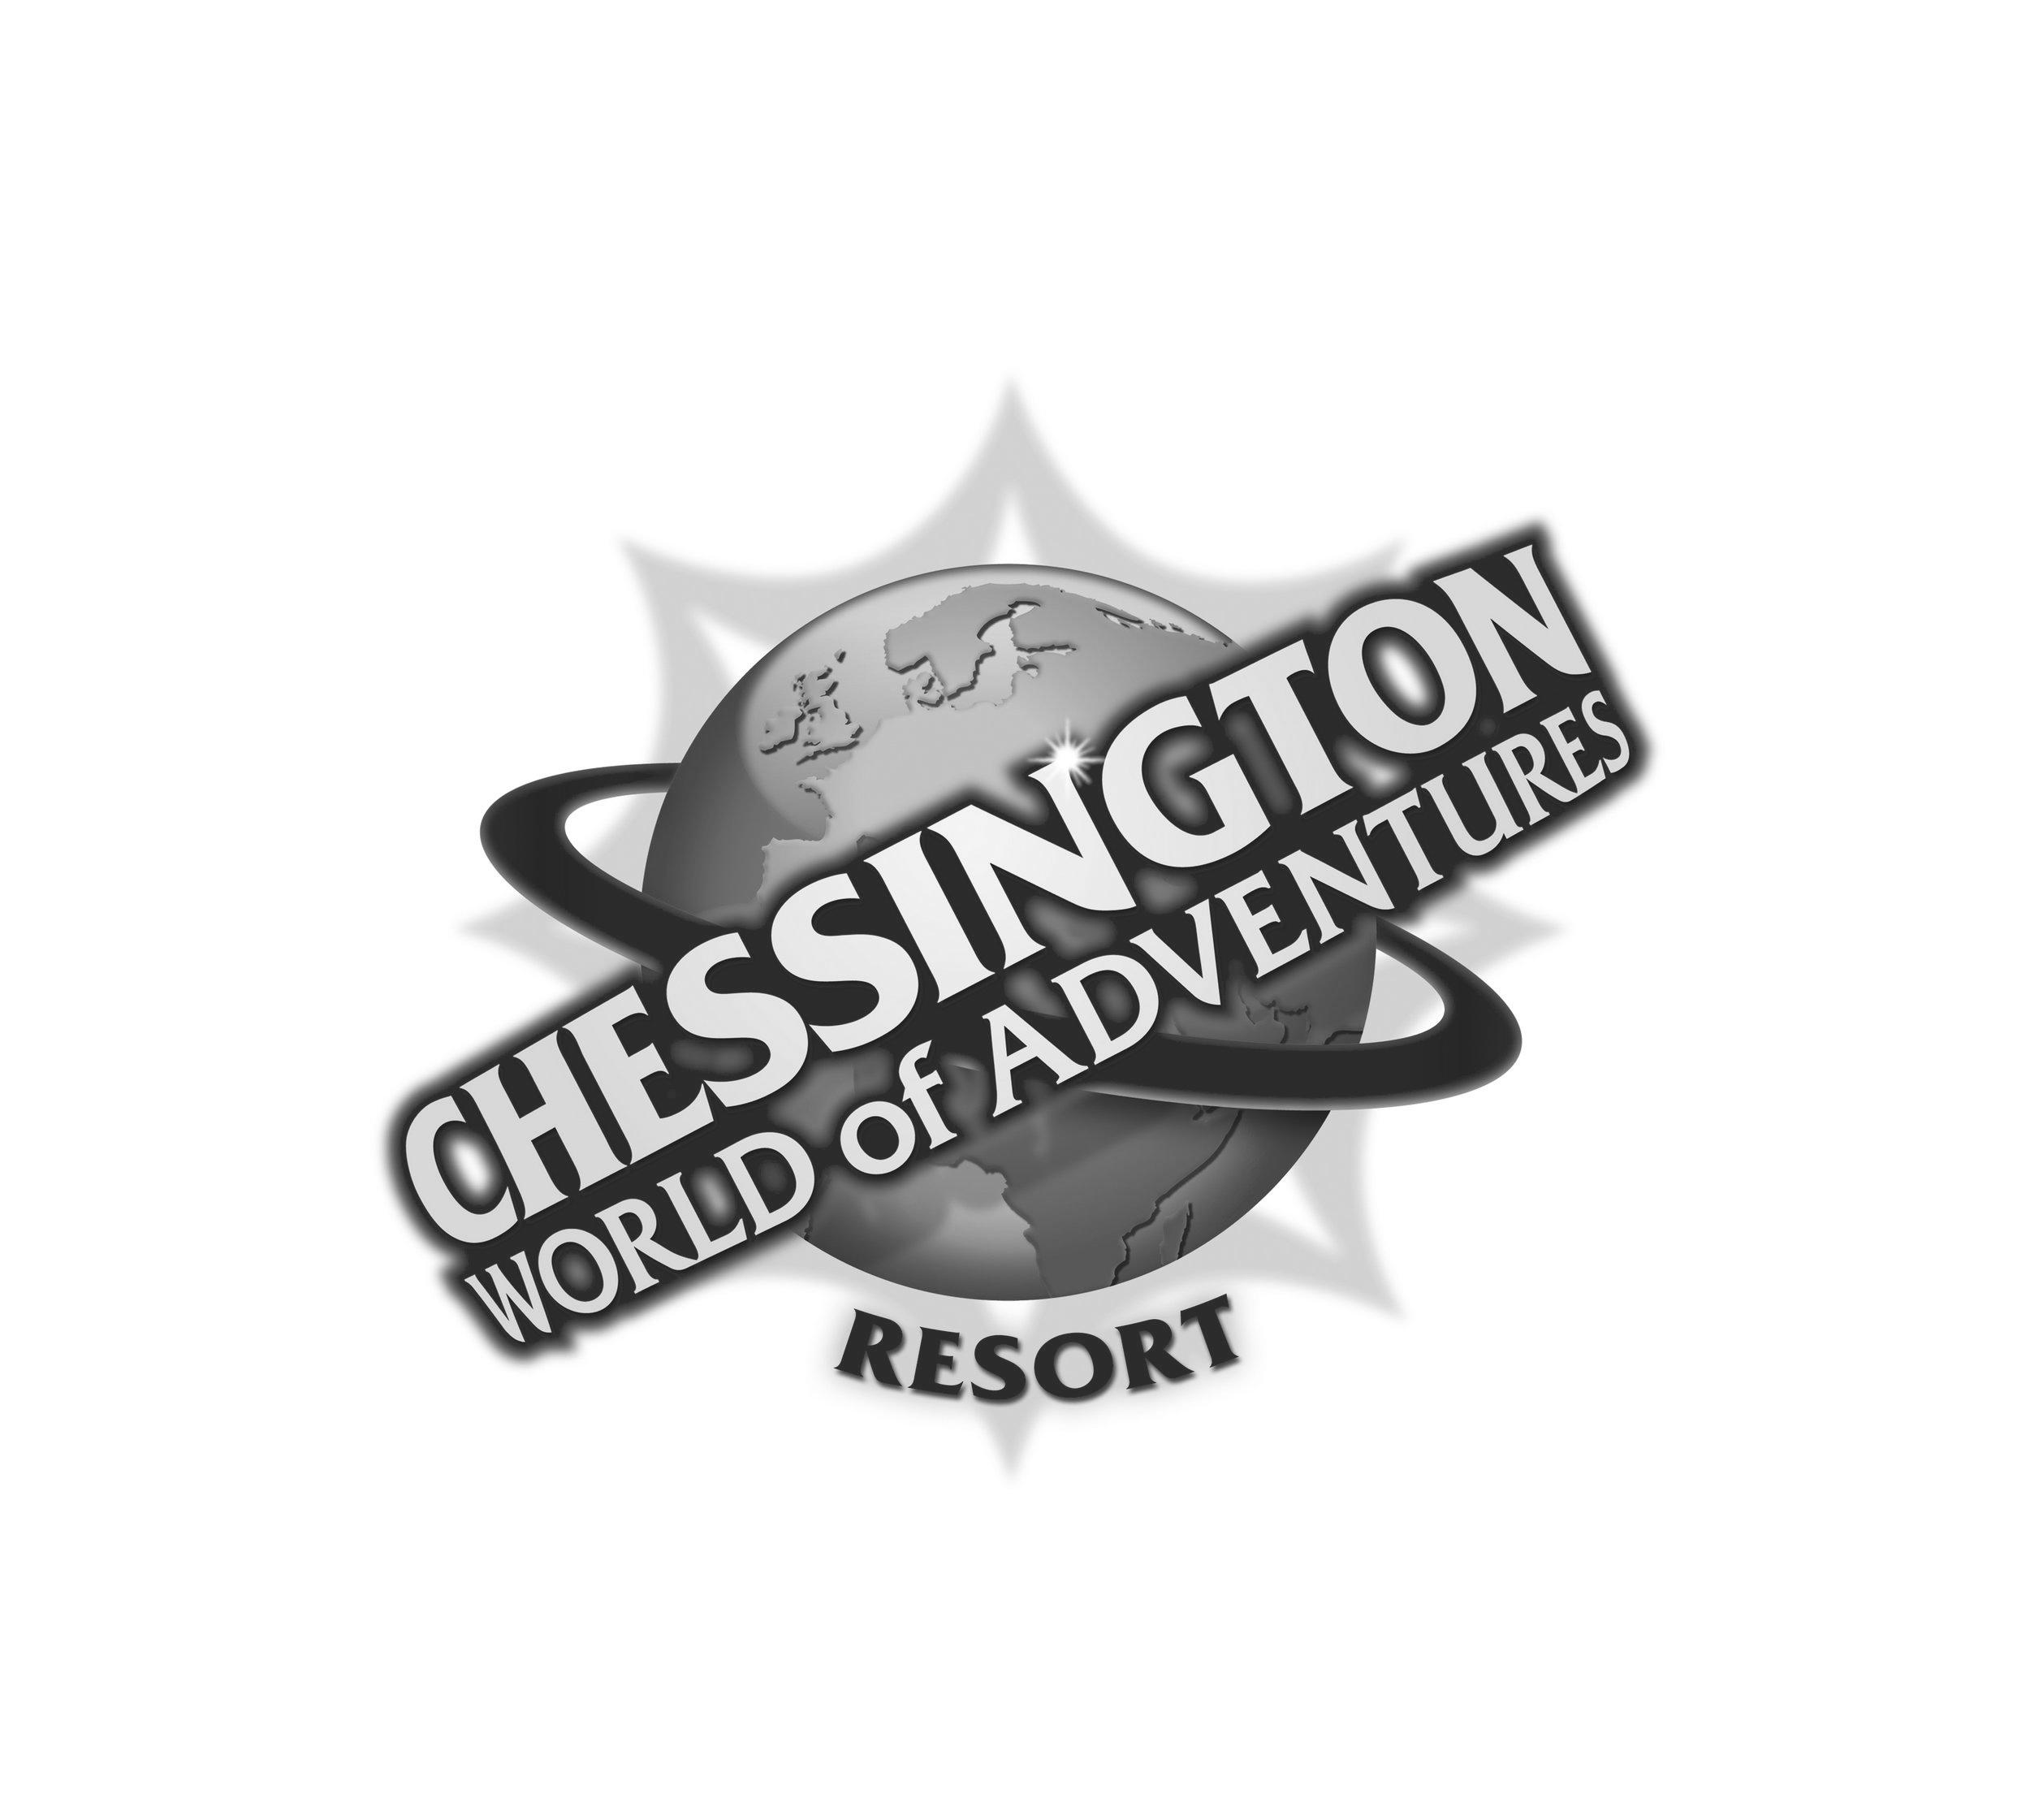 chessington-world-of-adventures-resort.jpg